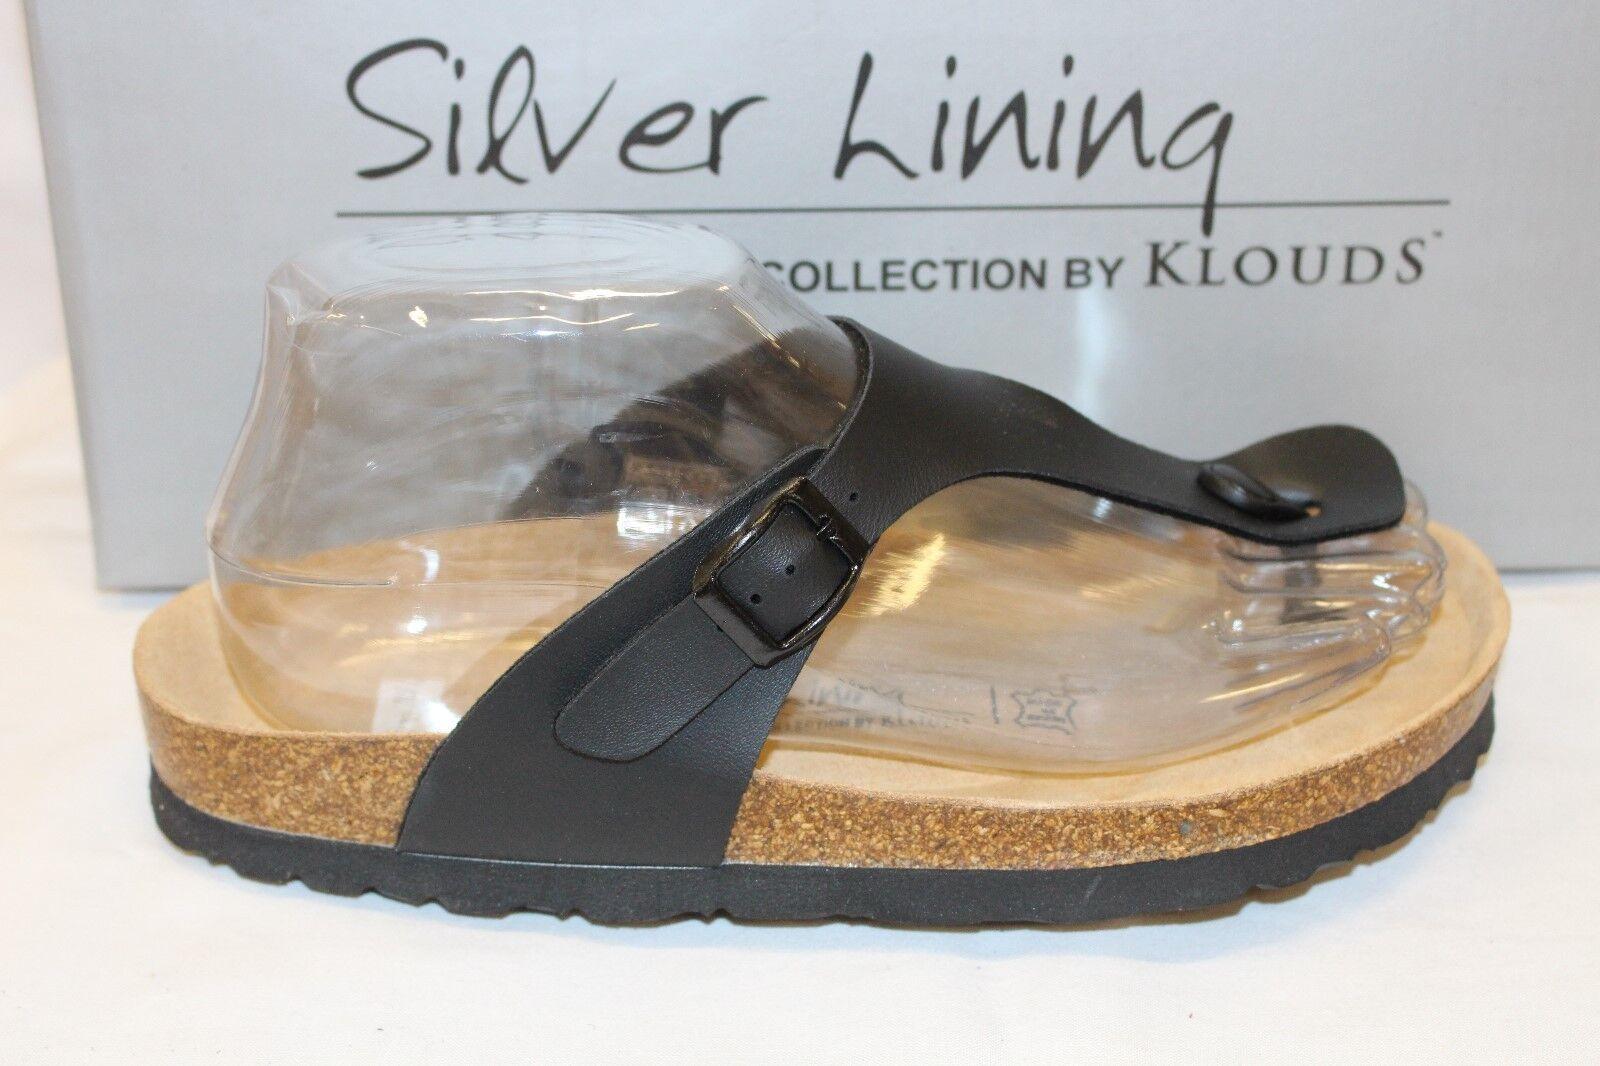 Damas Zapatos Calzado-Plata Calzado-Plata Calzado-Plata Forros rosados Tanga Negro  la mejor oferta de tienda online